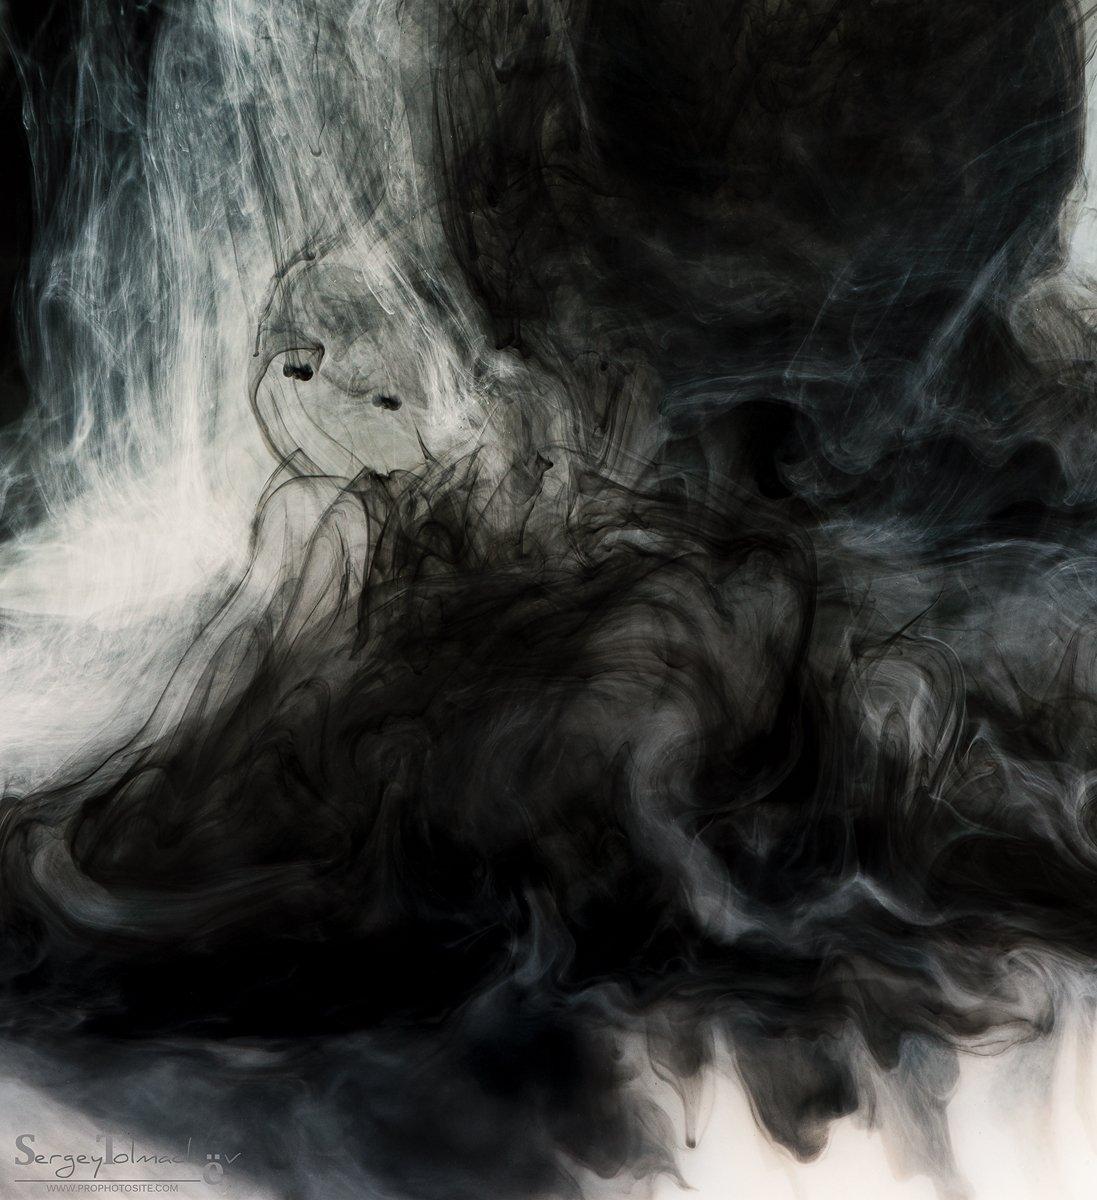 арт, абстракция, макро, цвет, краски, сергейтолмачев,, Сергей Толмачев